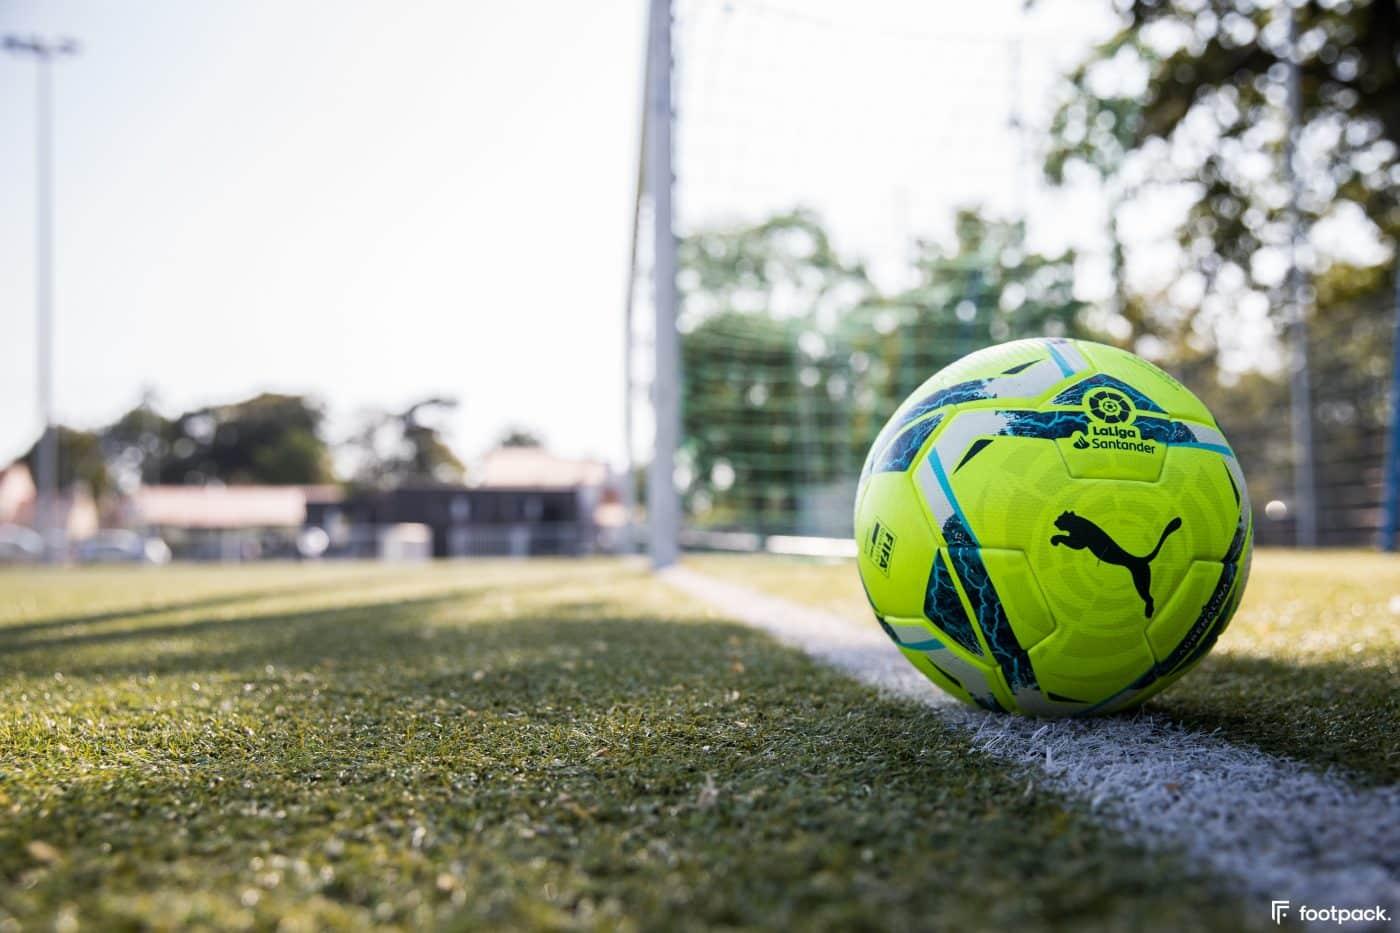 ballon-puma-barcelone-real-madrid-footpack-puma-liga-ball-footapck-9